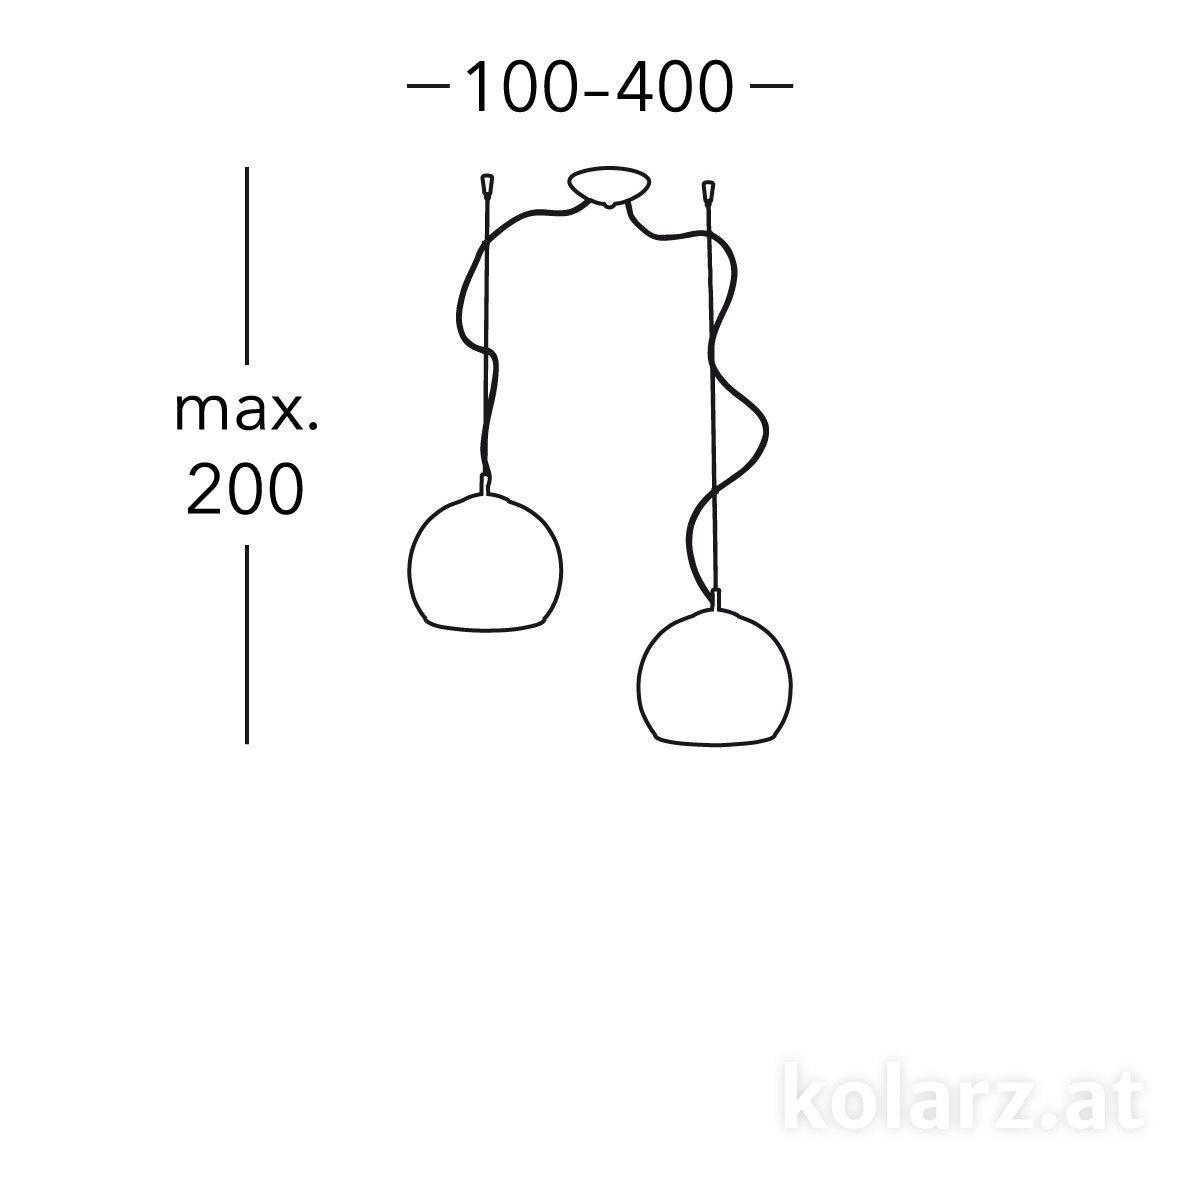 0392-32-3-Tc-Au-s1.jpg